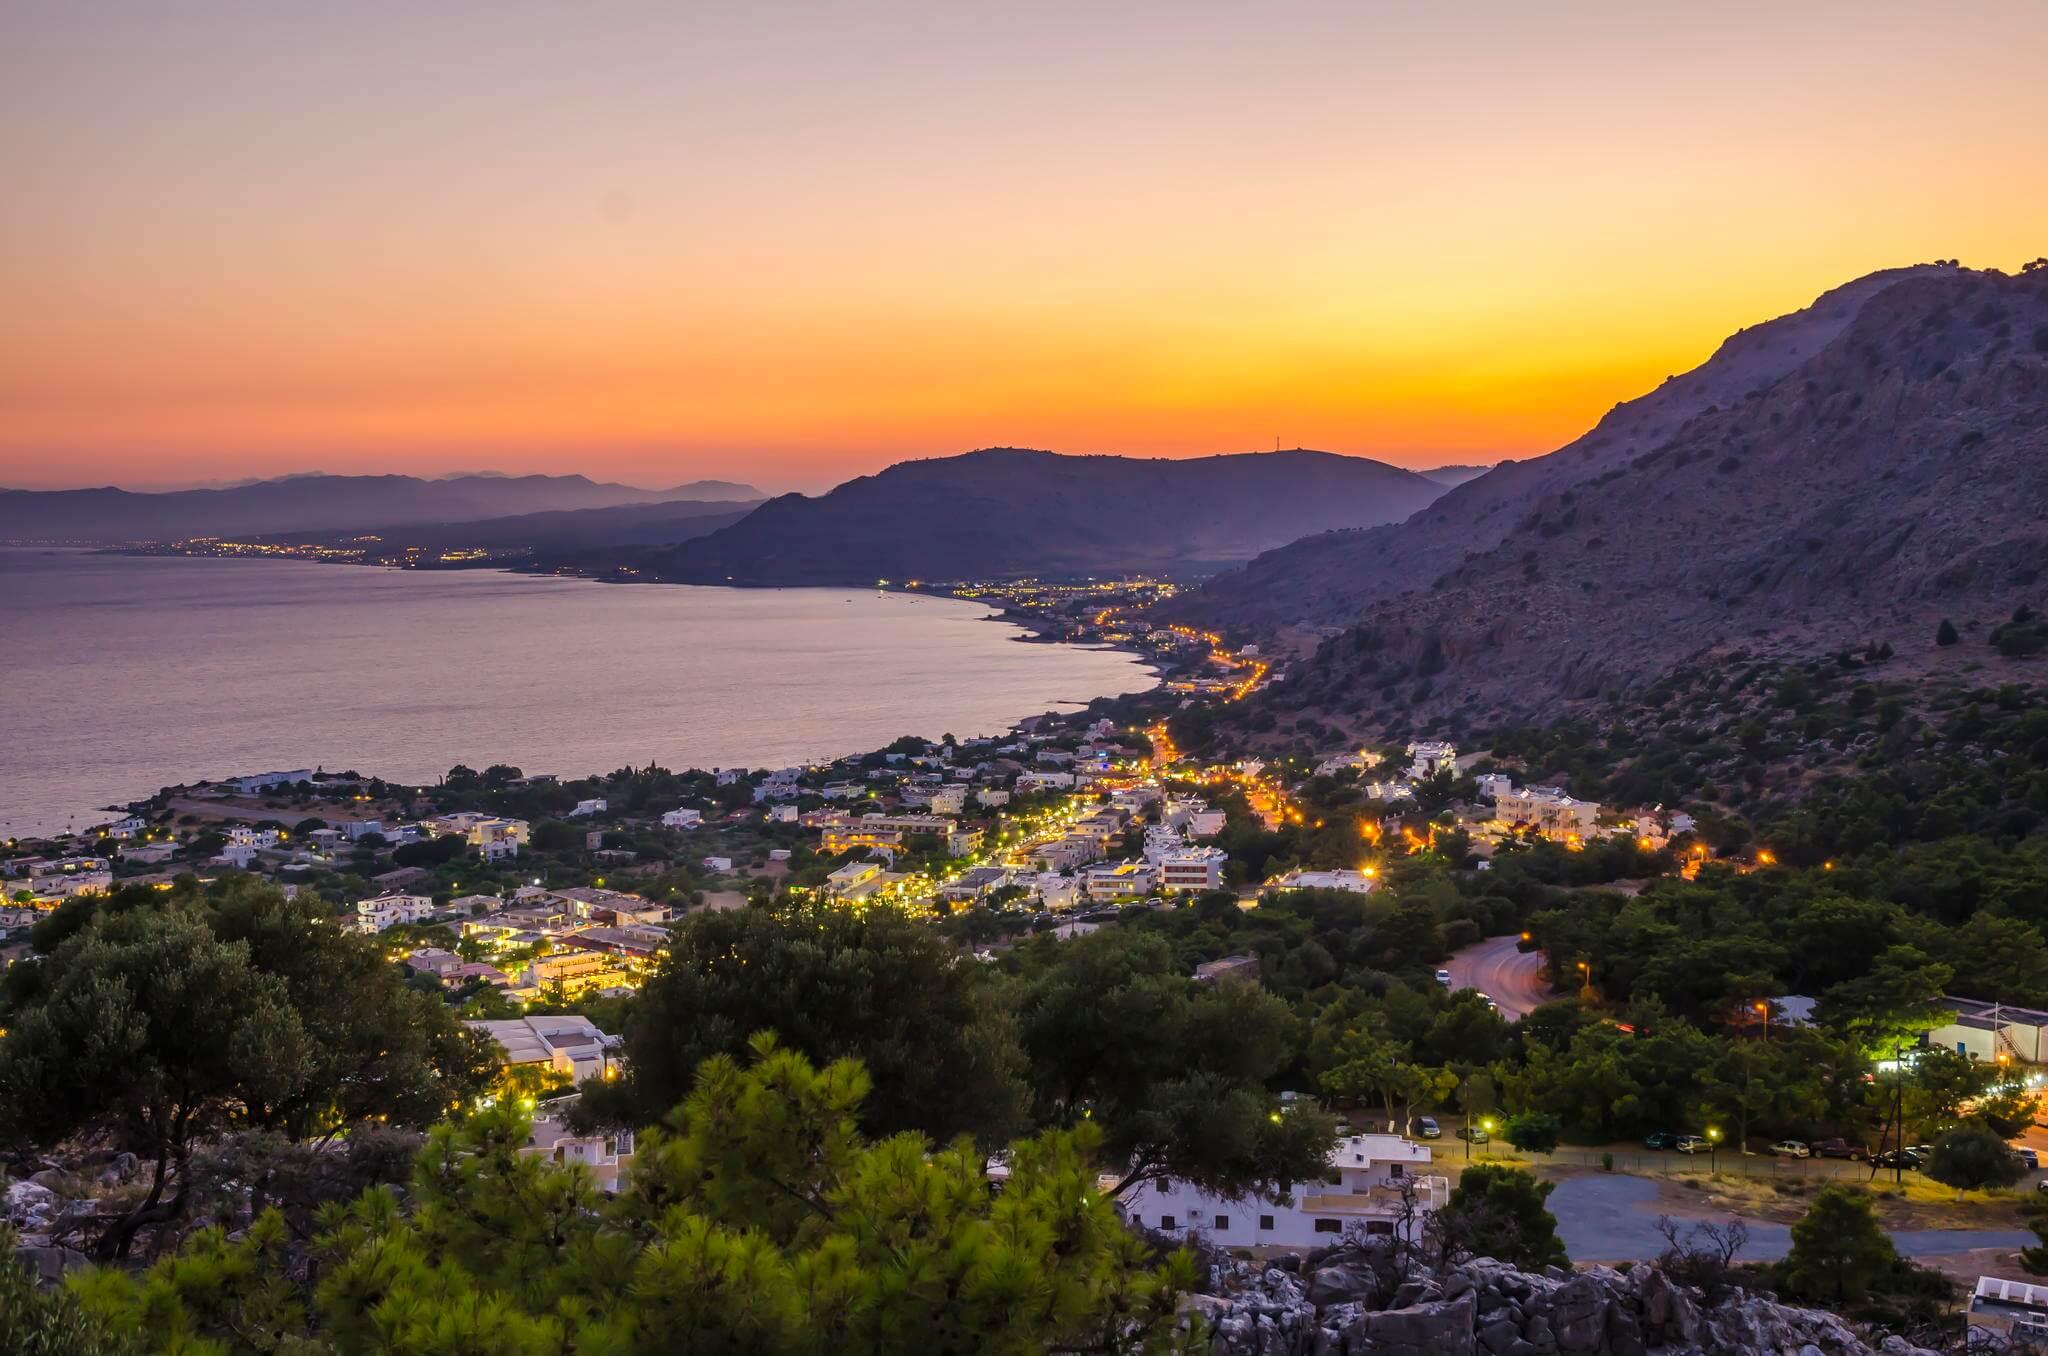 Pefkos Köyü Akşam